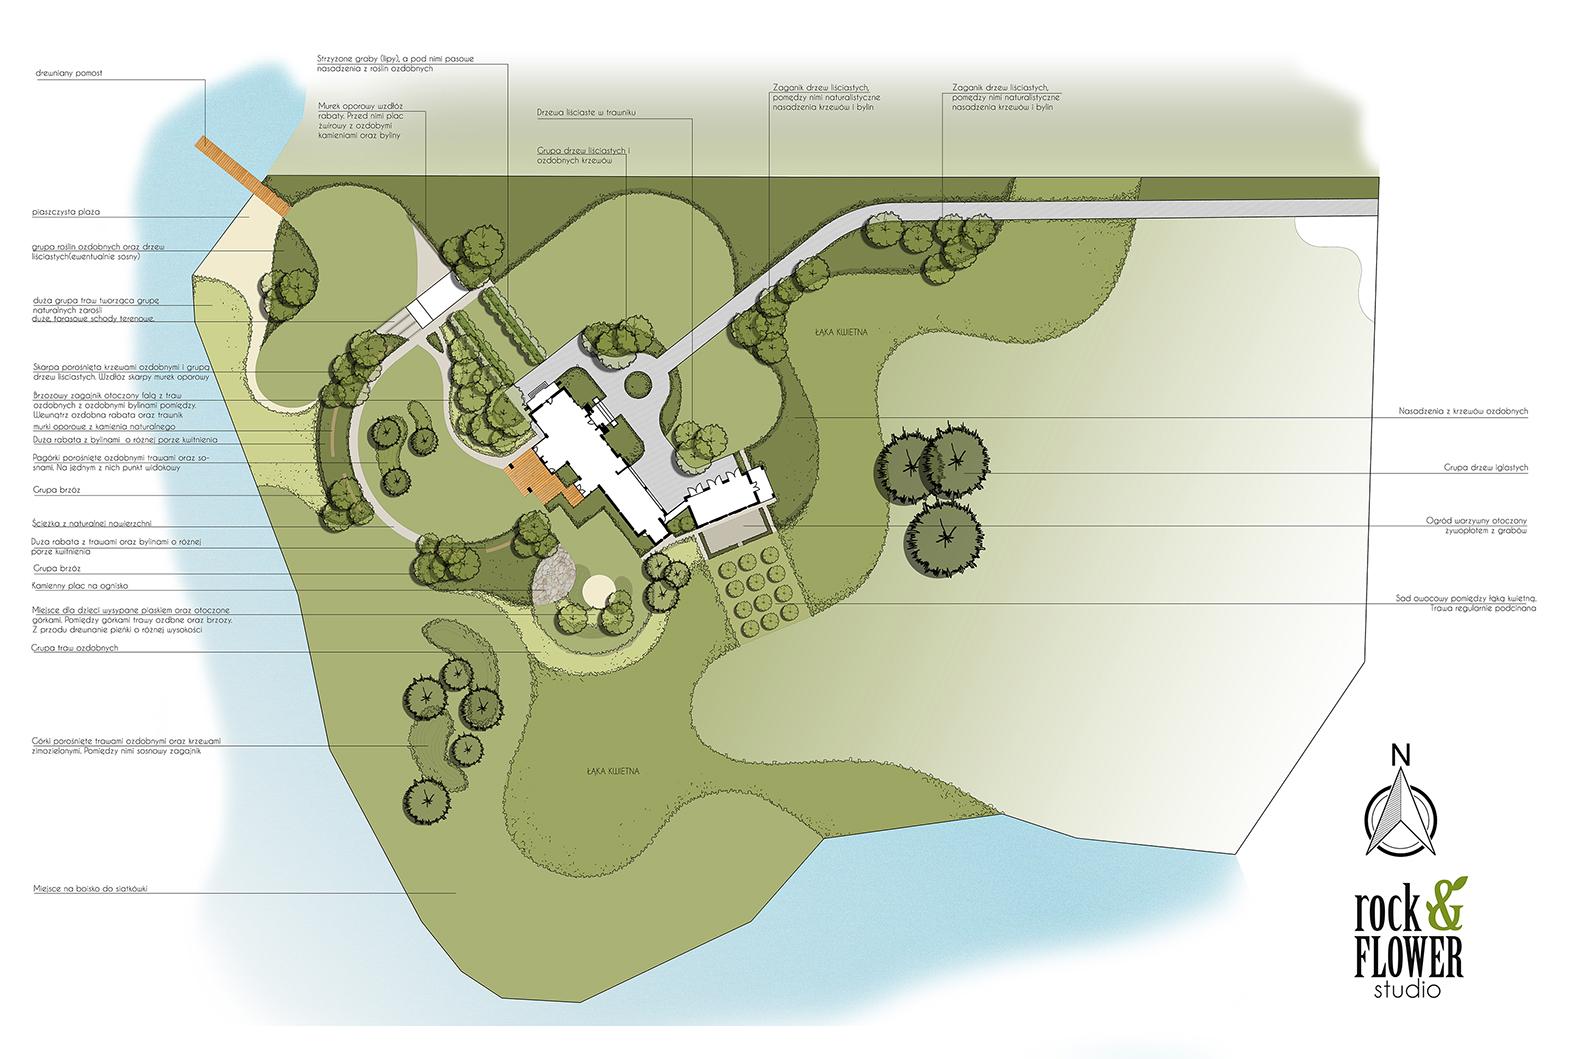 velka-zahrada-u-jezera-praha-rockandflowerstudio-navrh-zahrady-zahradniarchitektura-projekt-zahrady